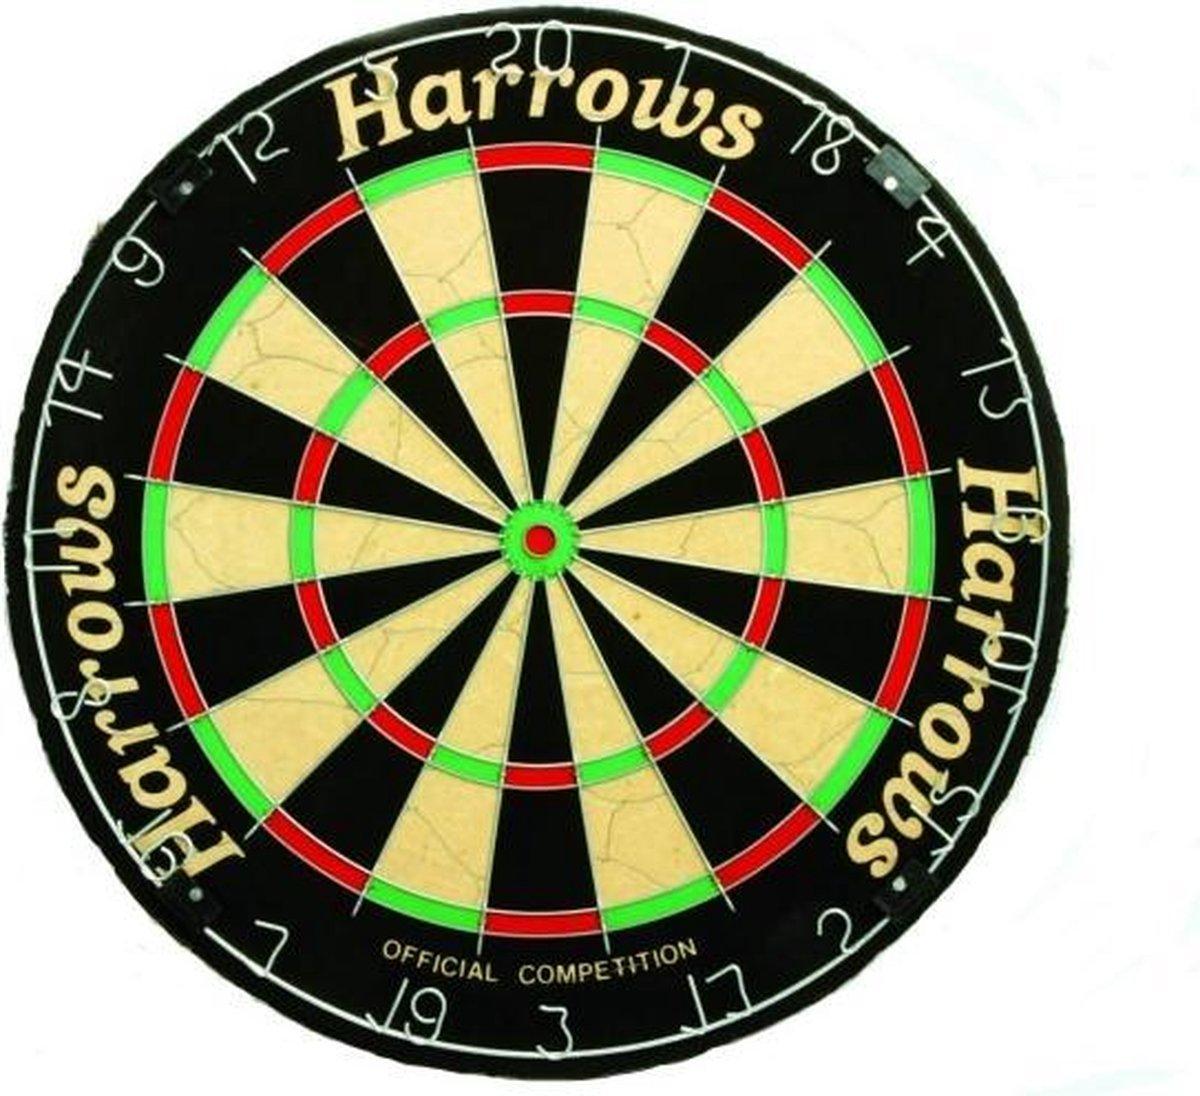 Harrows Darts Dartbord Official Competition